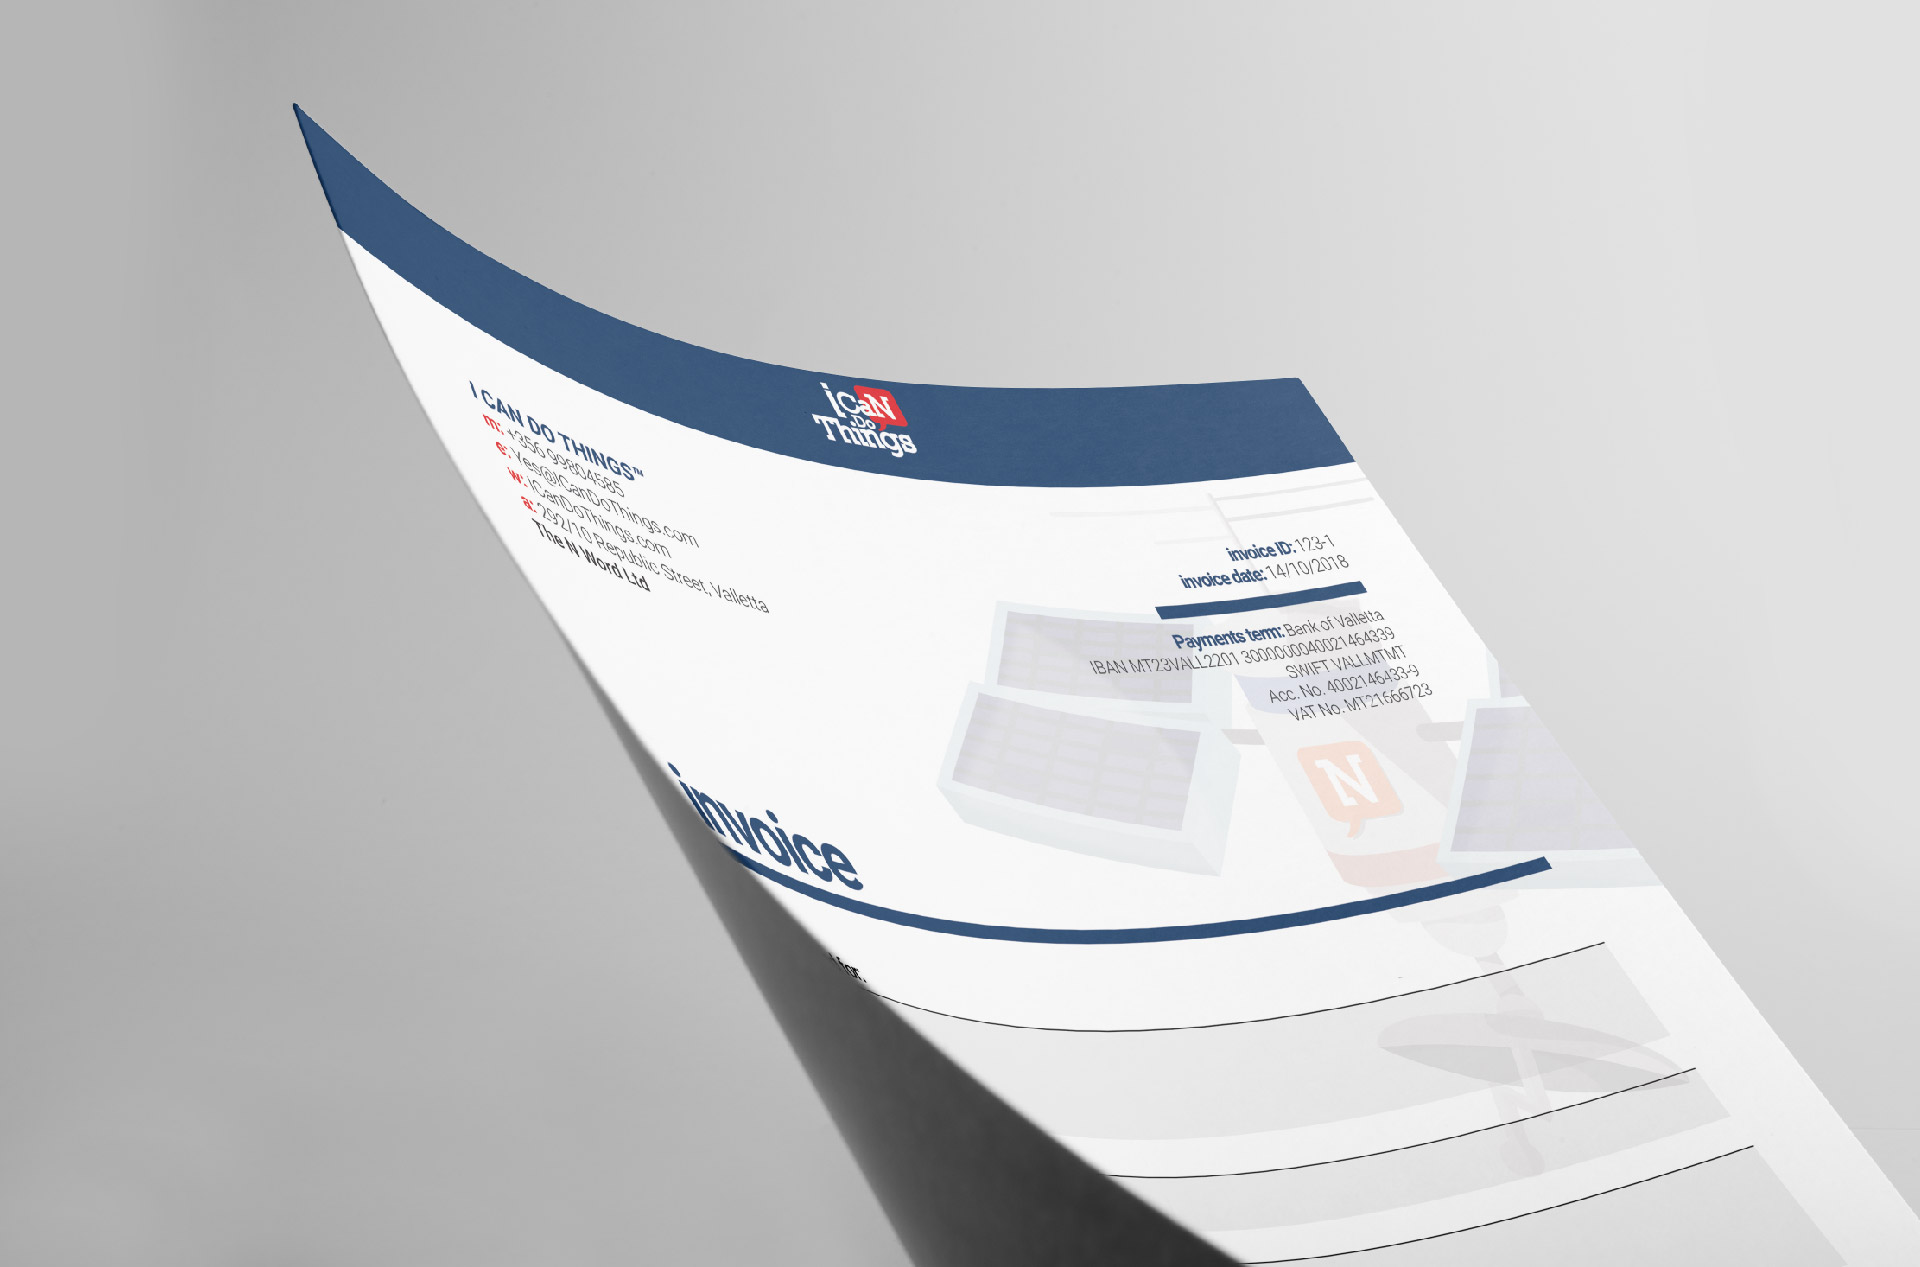 i can do things malta website design visual identity space moon general condition belgrade serbia jovan lakic